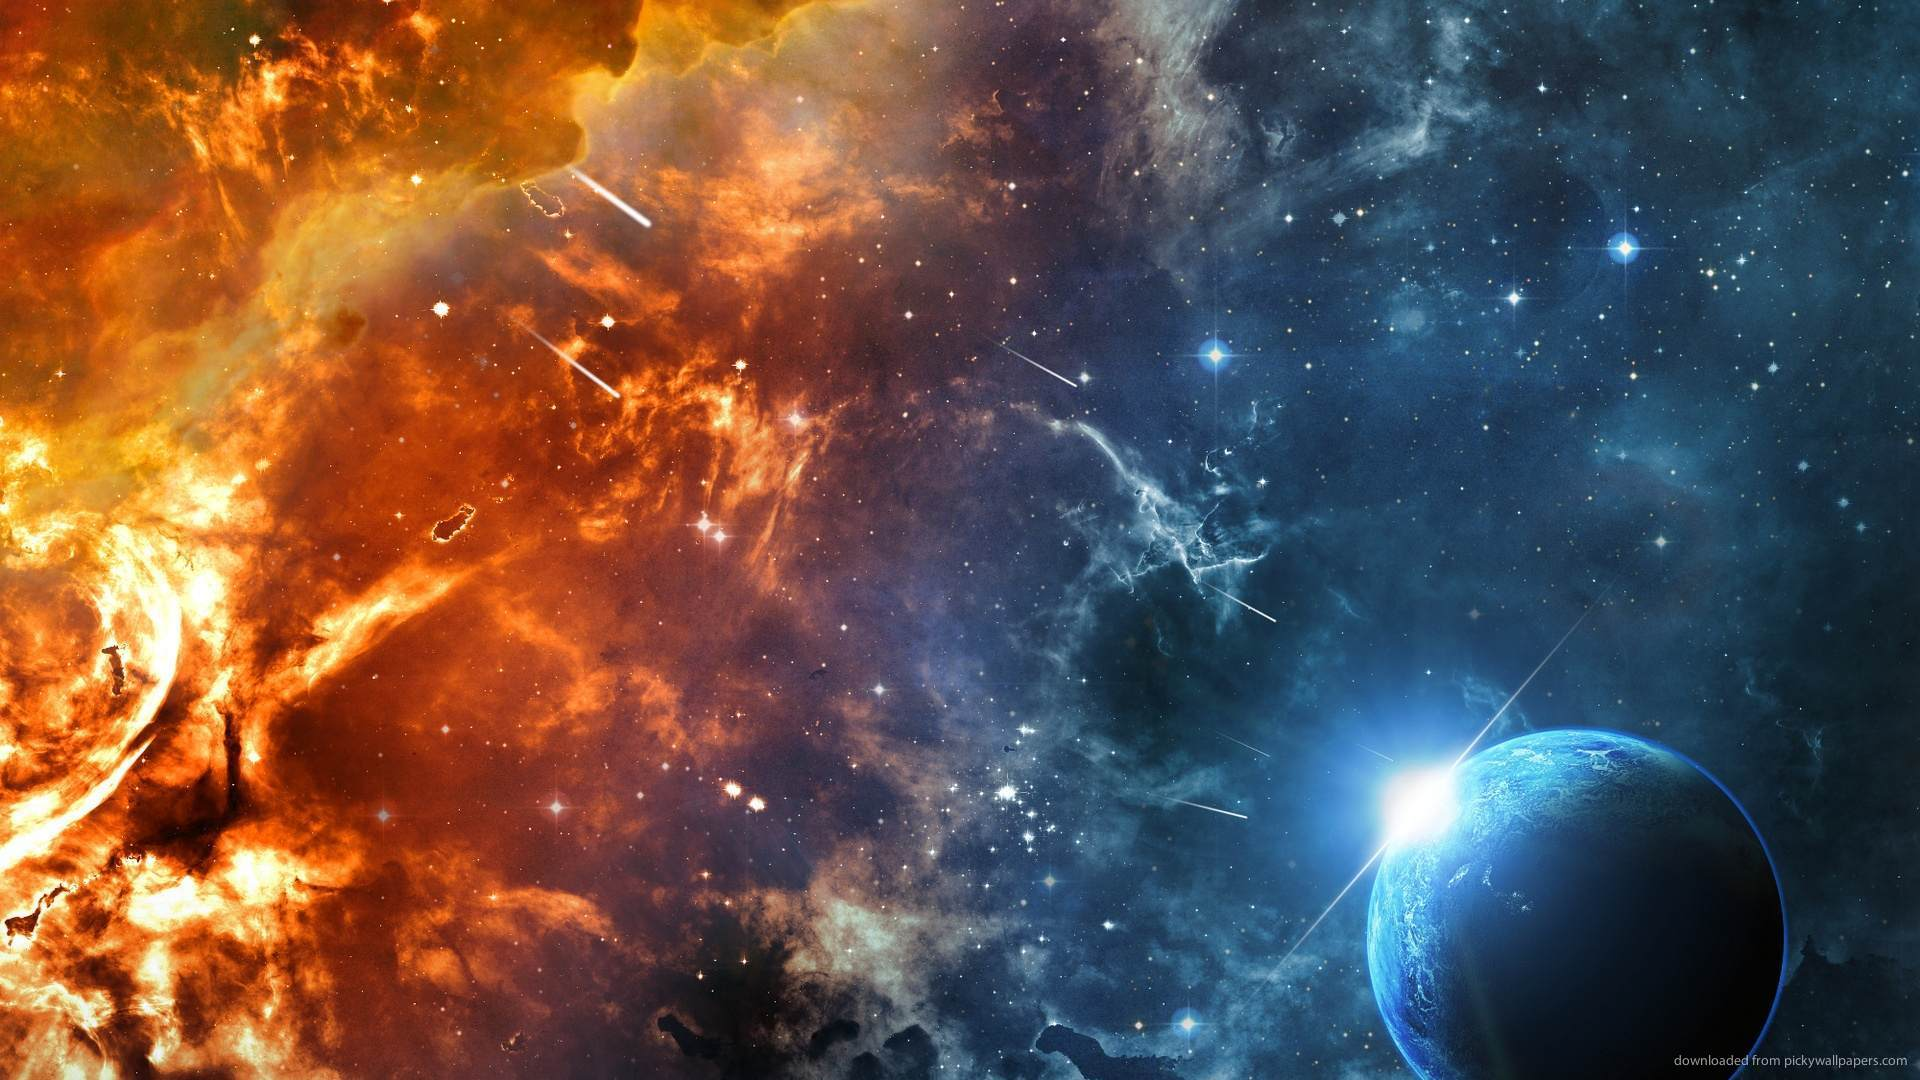 shutterstock cosmic art science - photo #49